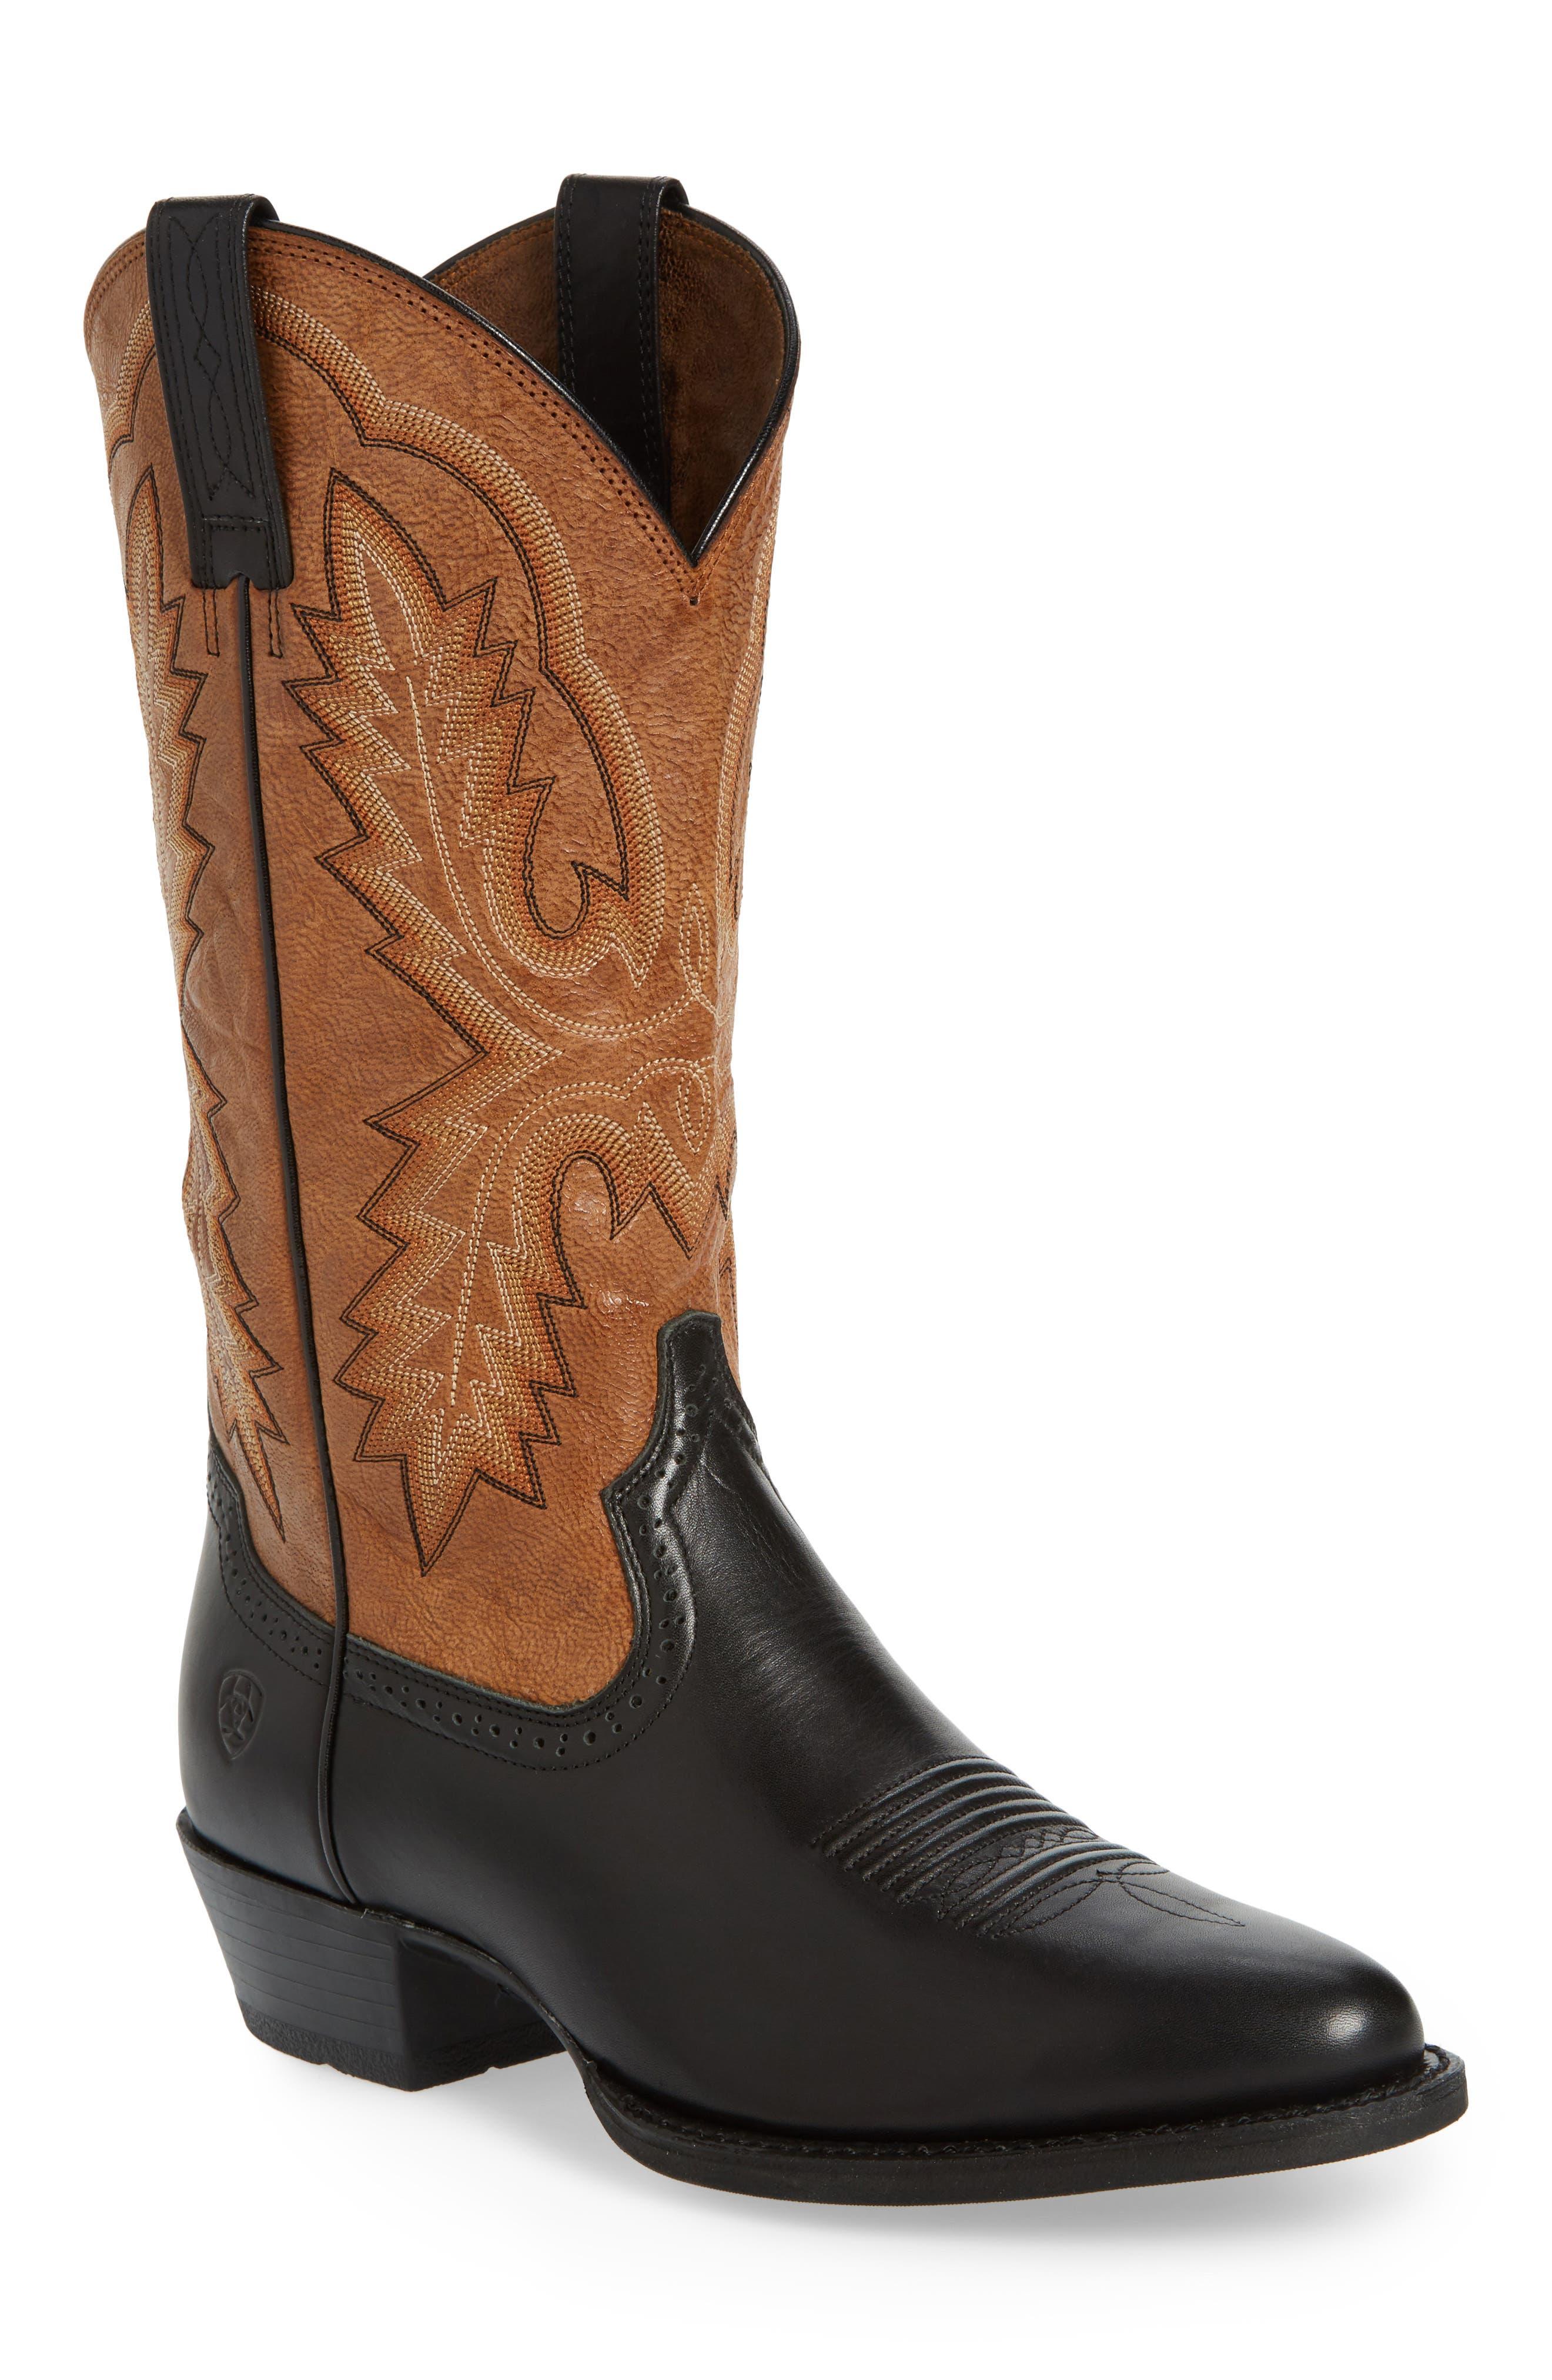 Main Image - Ariat Heritage Calhoun Western R-Toe Boot (Men)